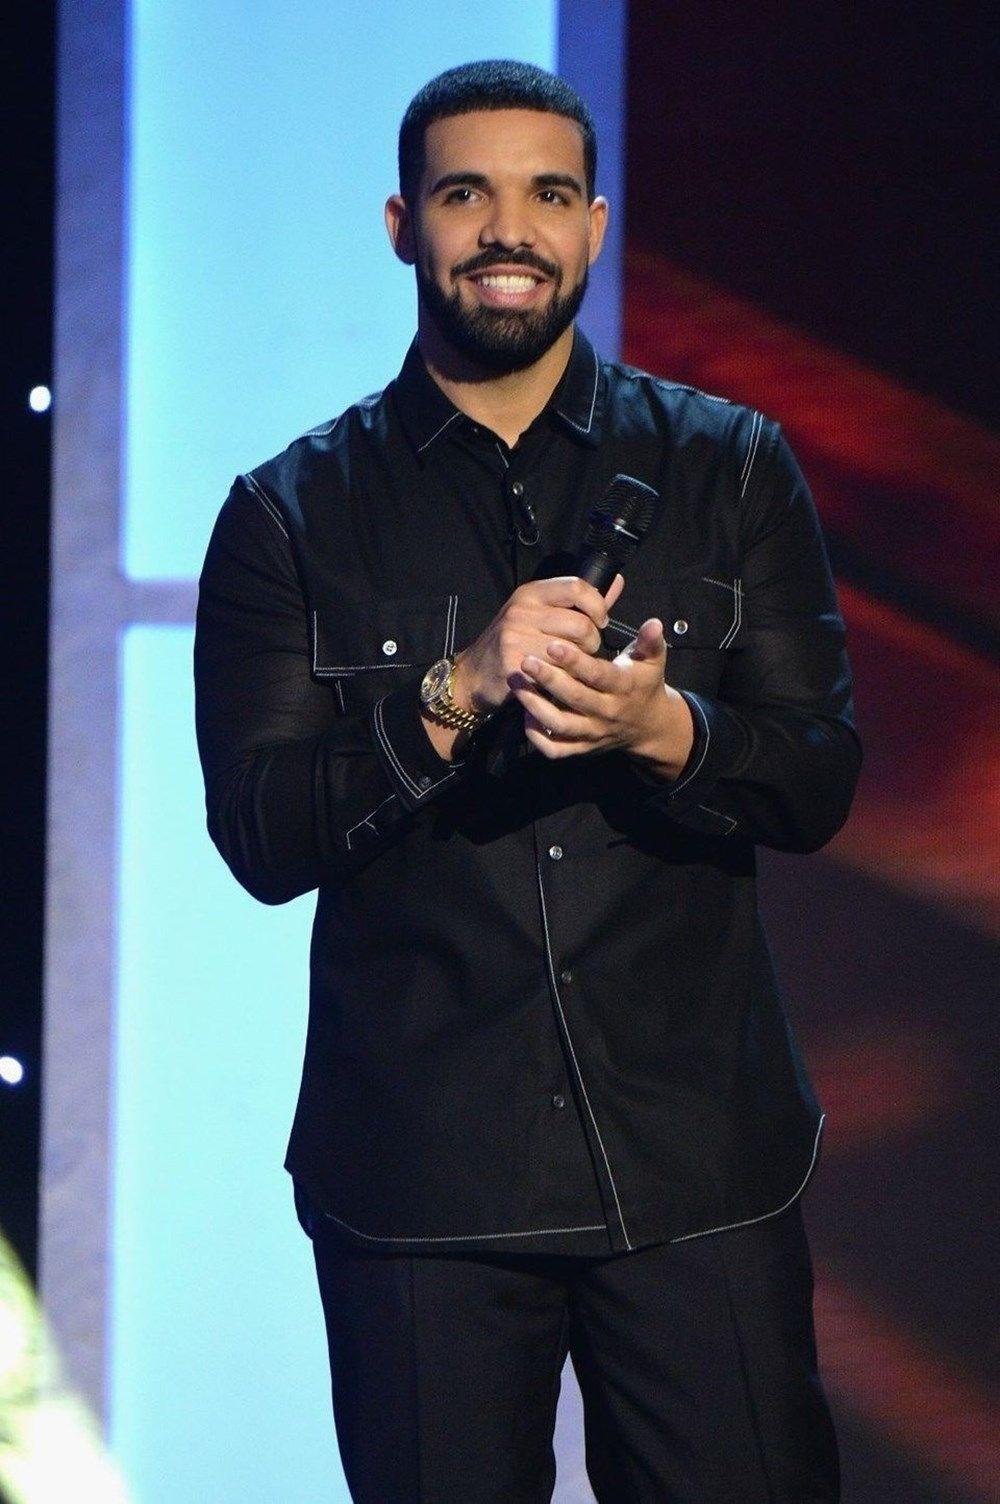 Barack Obama'dan biyografi filminde başrol için Drake'e onay - 3